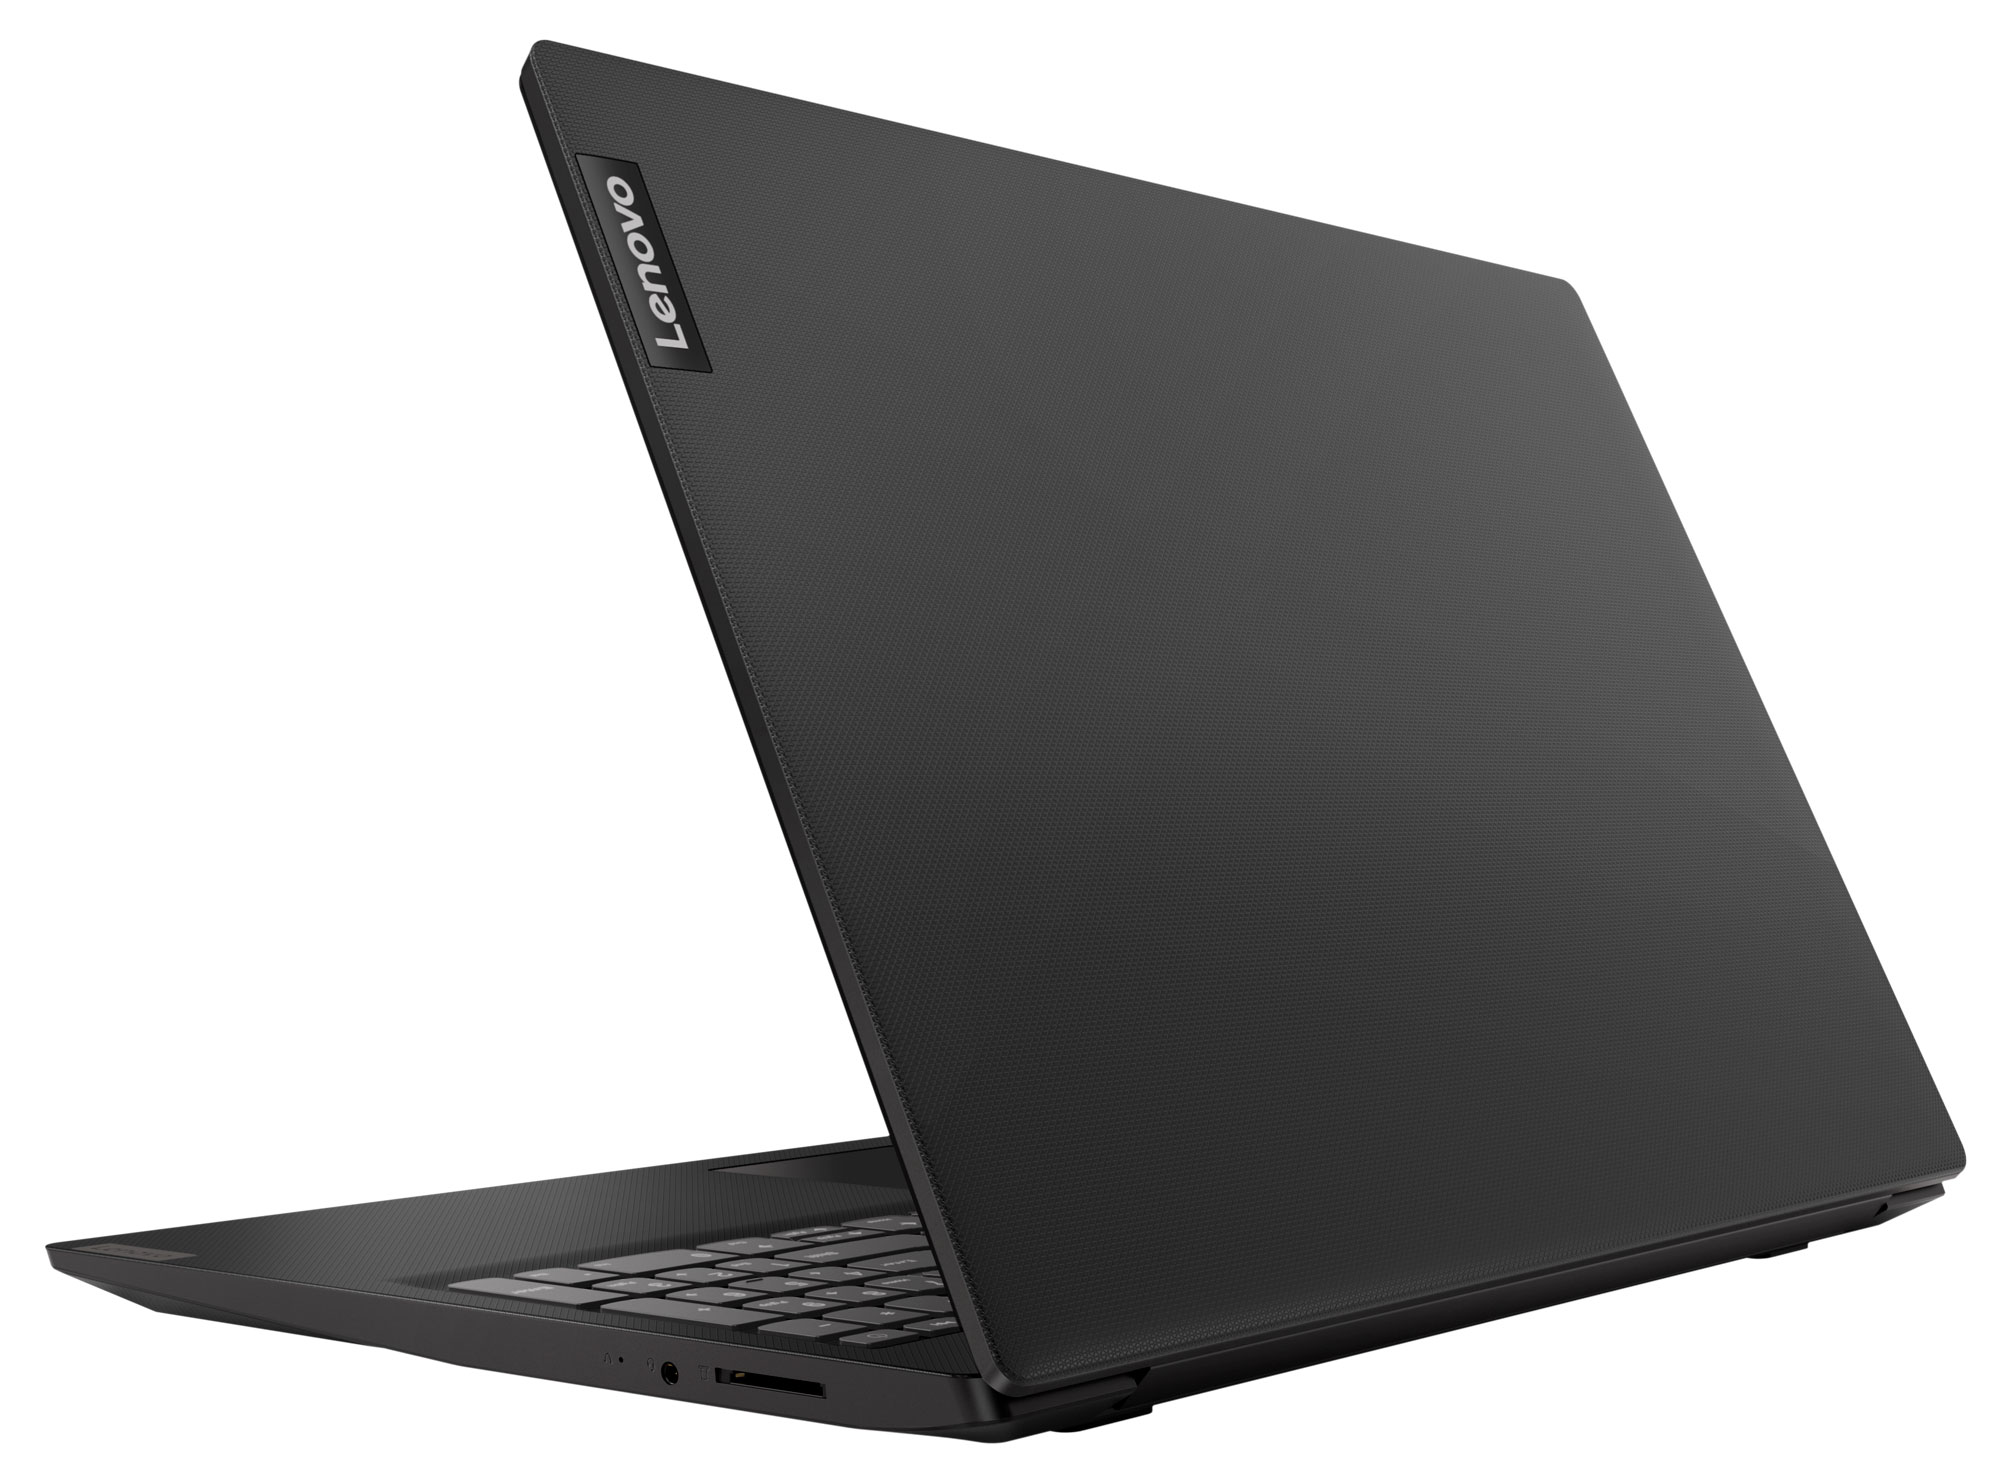 Фото  Ноутбук Lenovo ideapad S145-15AST Black  (81N300CFRE)